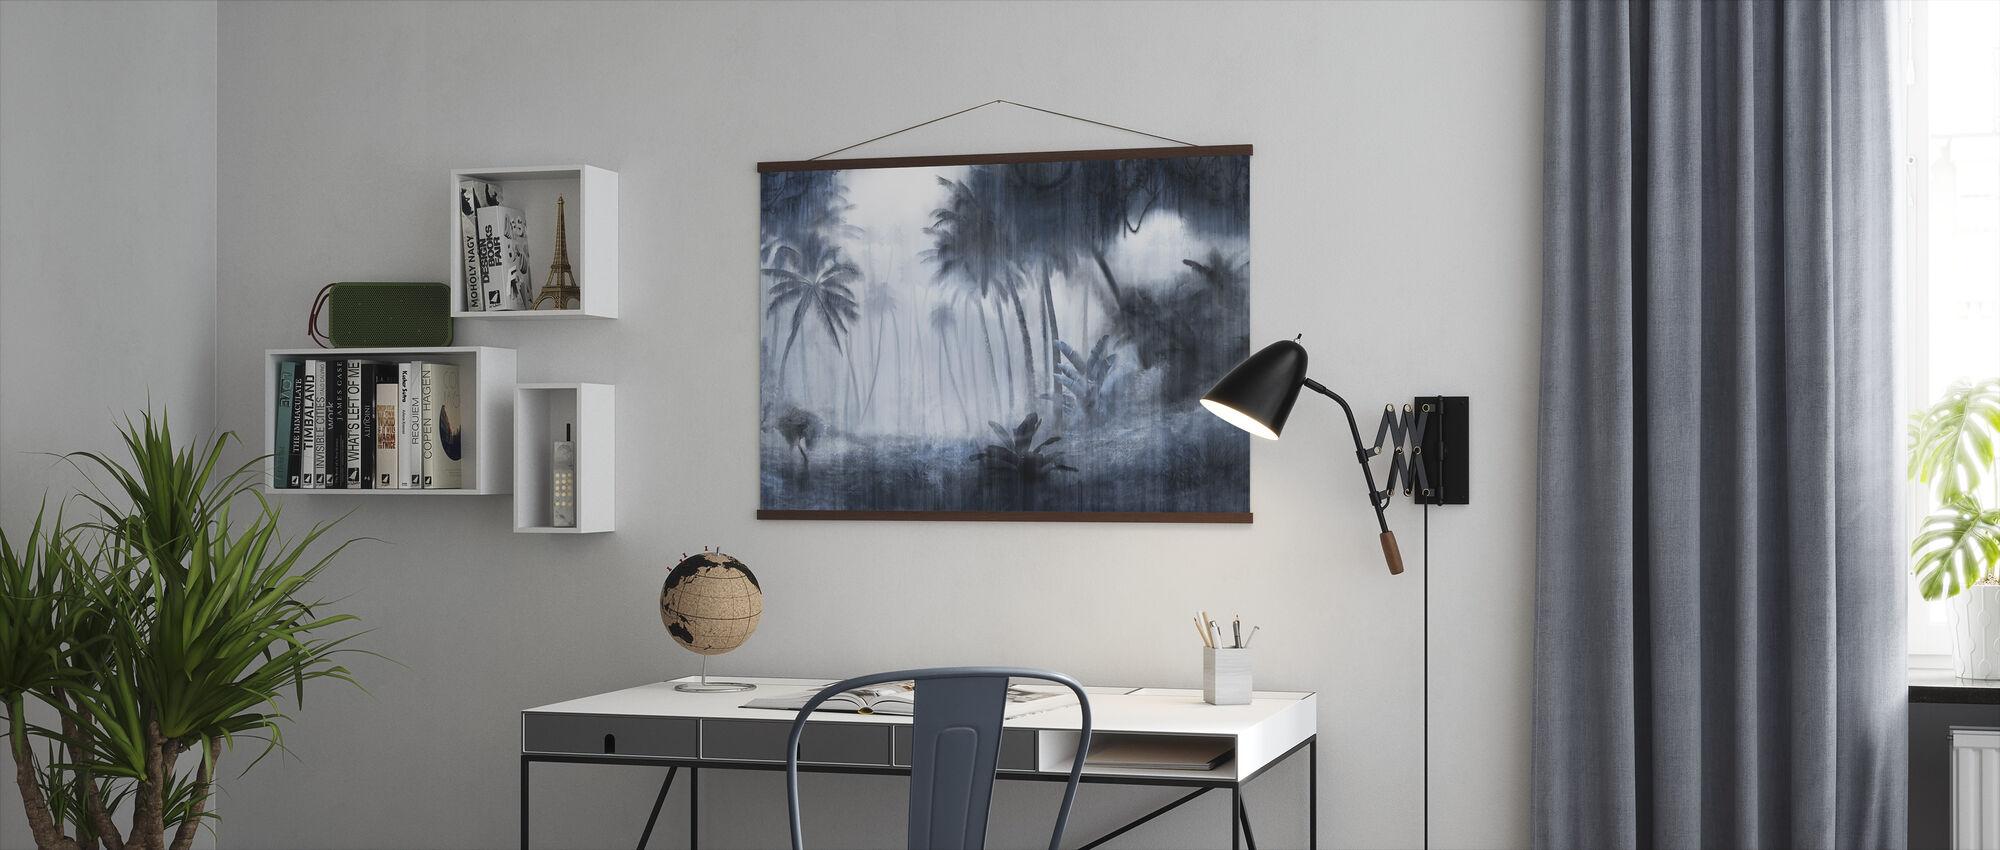 Definitive Tropical - Indigo - Poster - Office